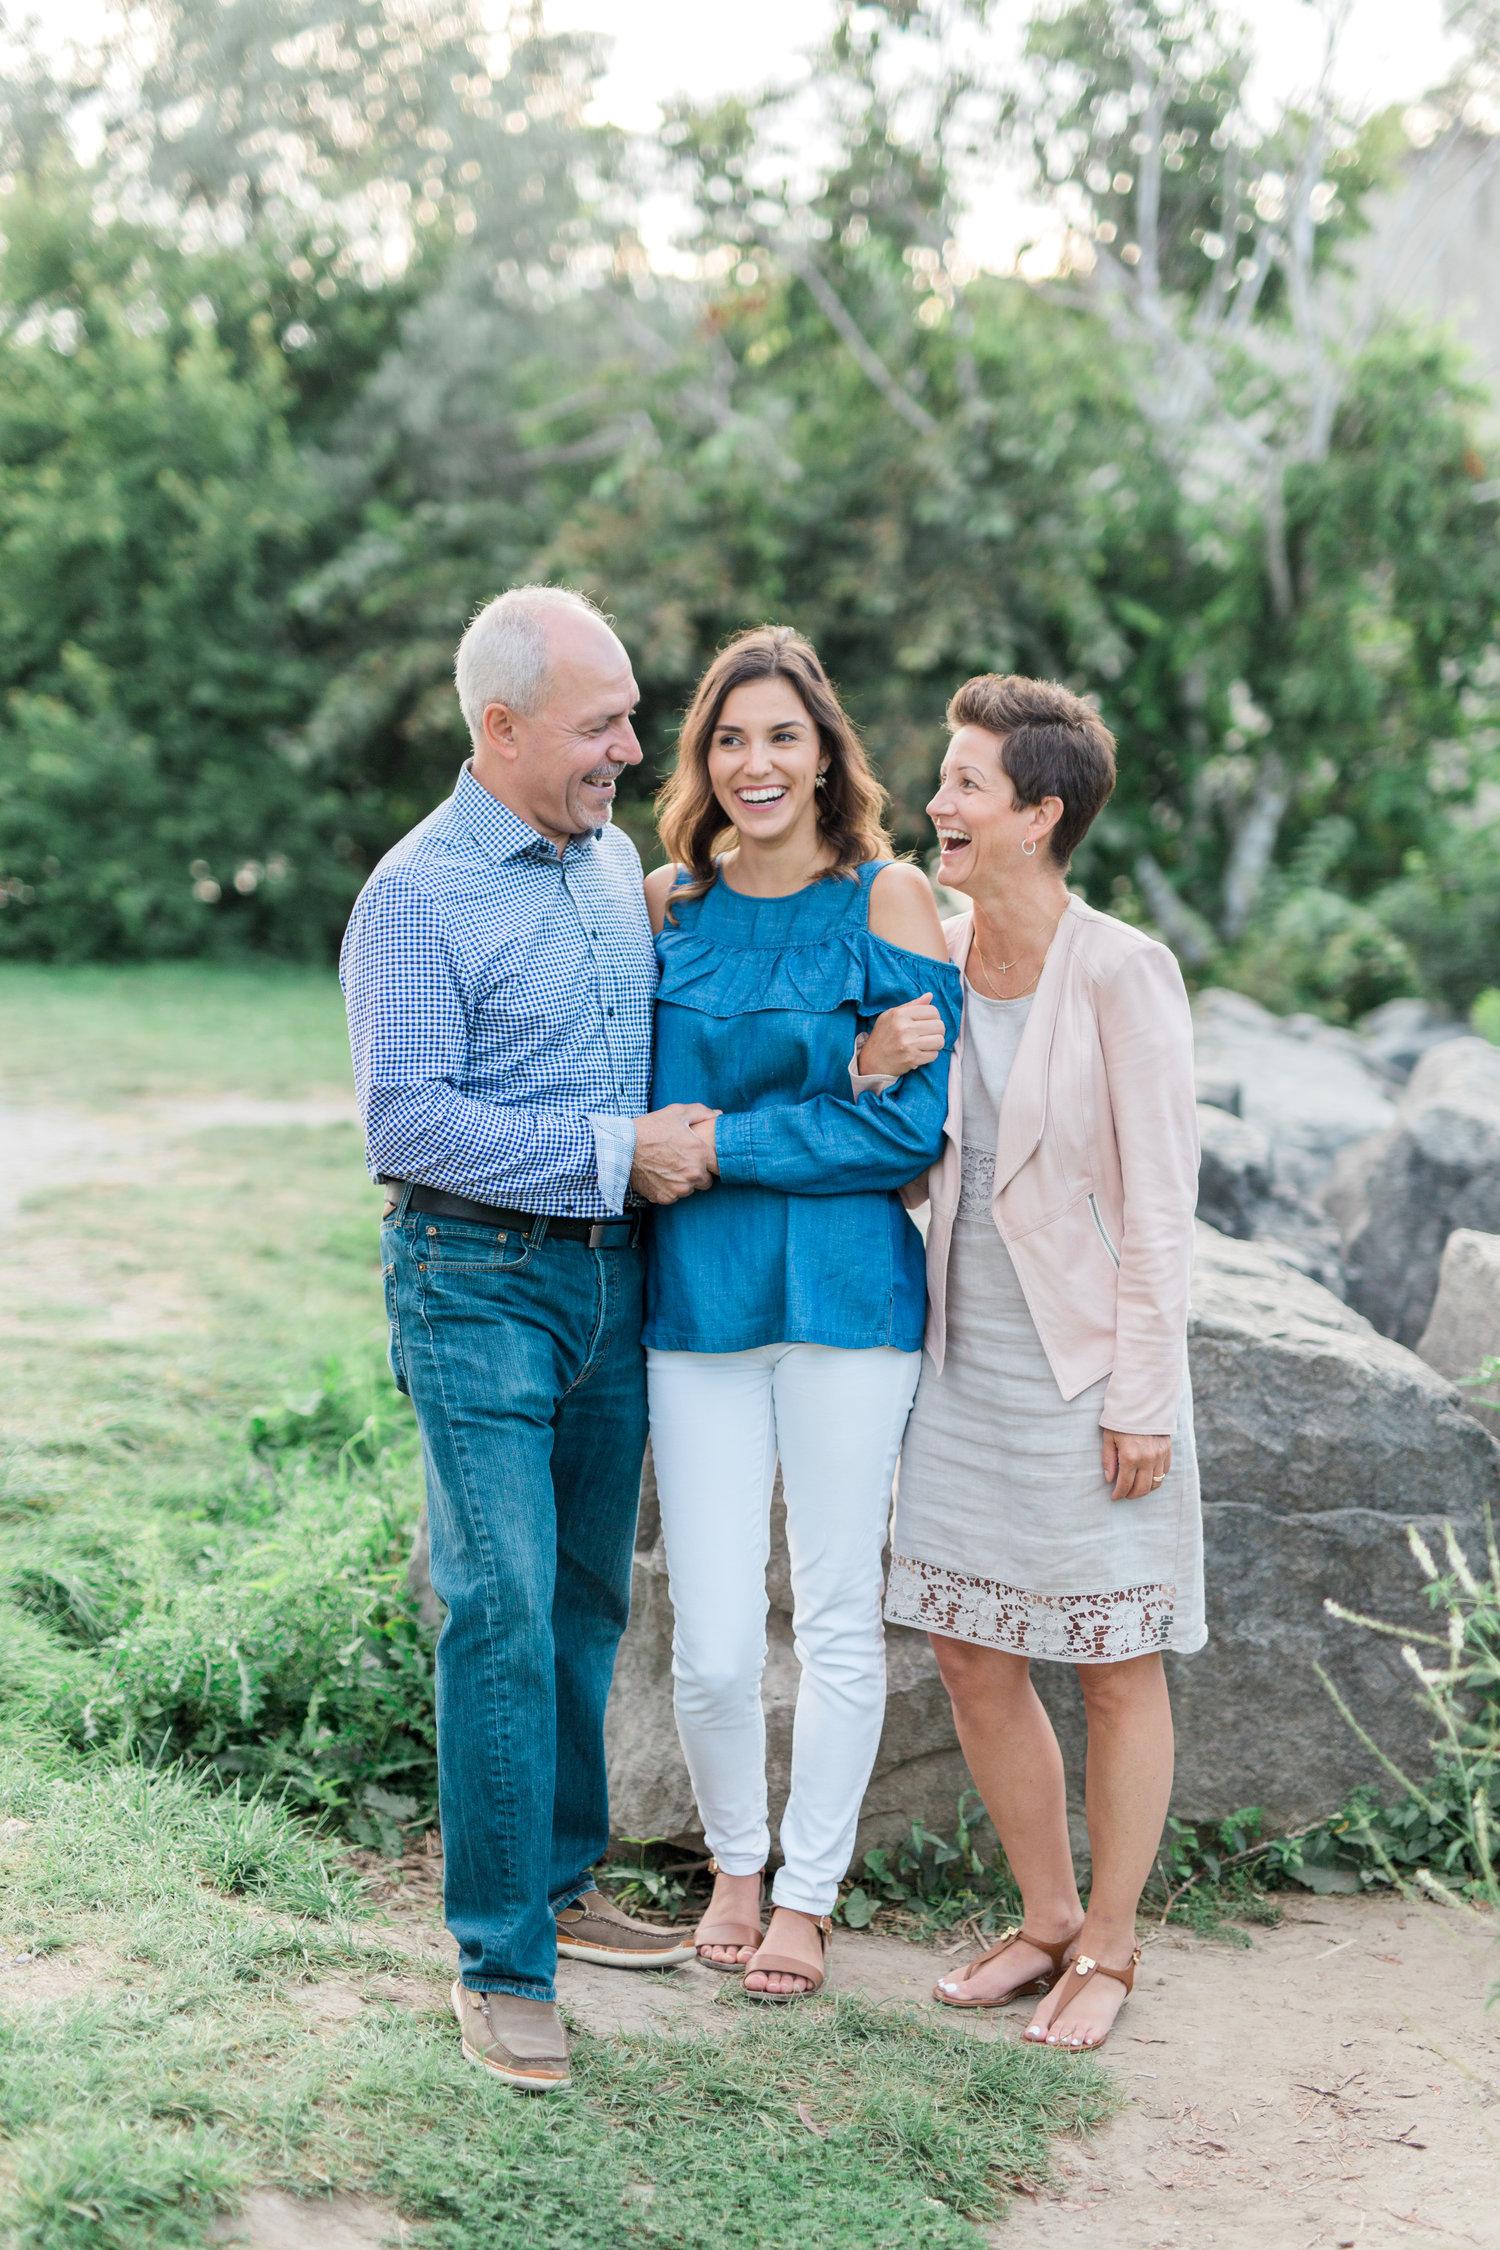 Danielle-Giroux-Amir-Golbazi-Genua-Family-Photography-Scarborough-Bluffs-9104.jpg